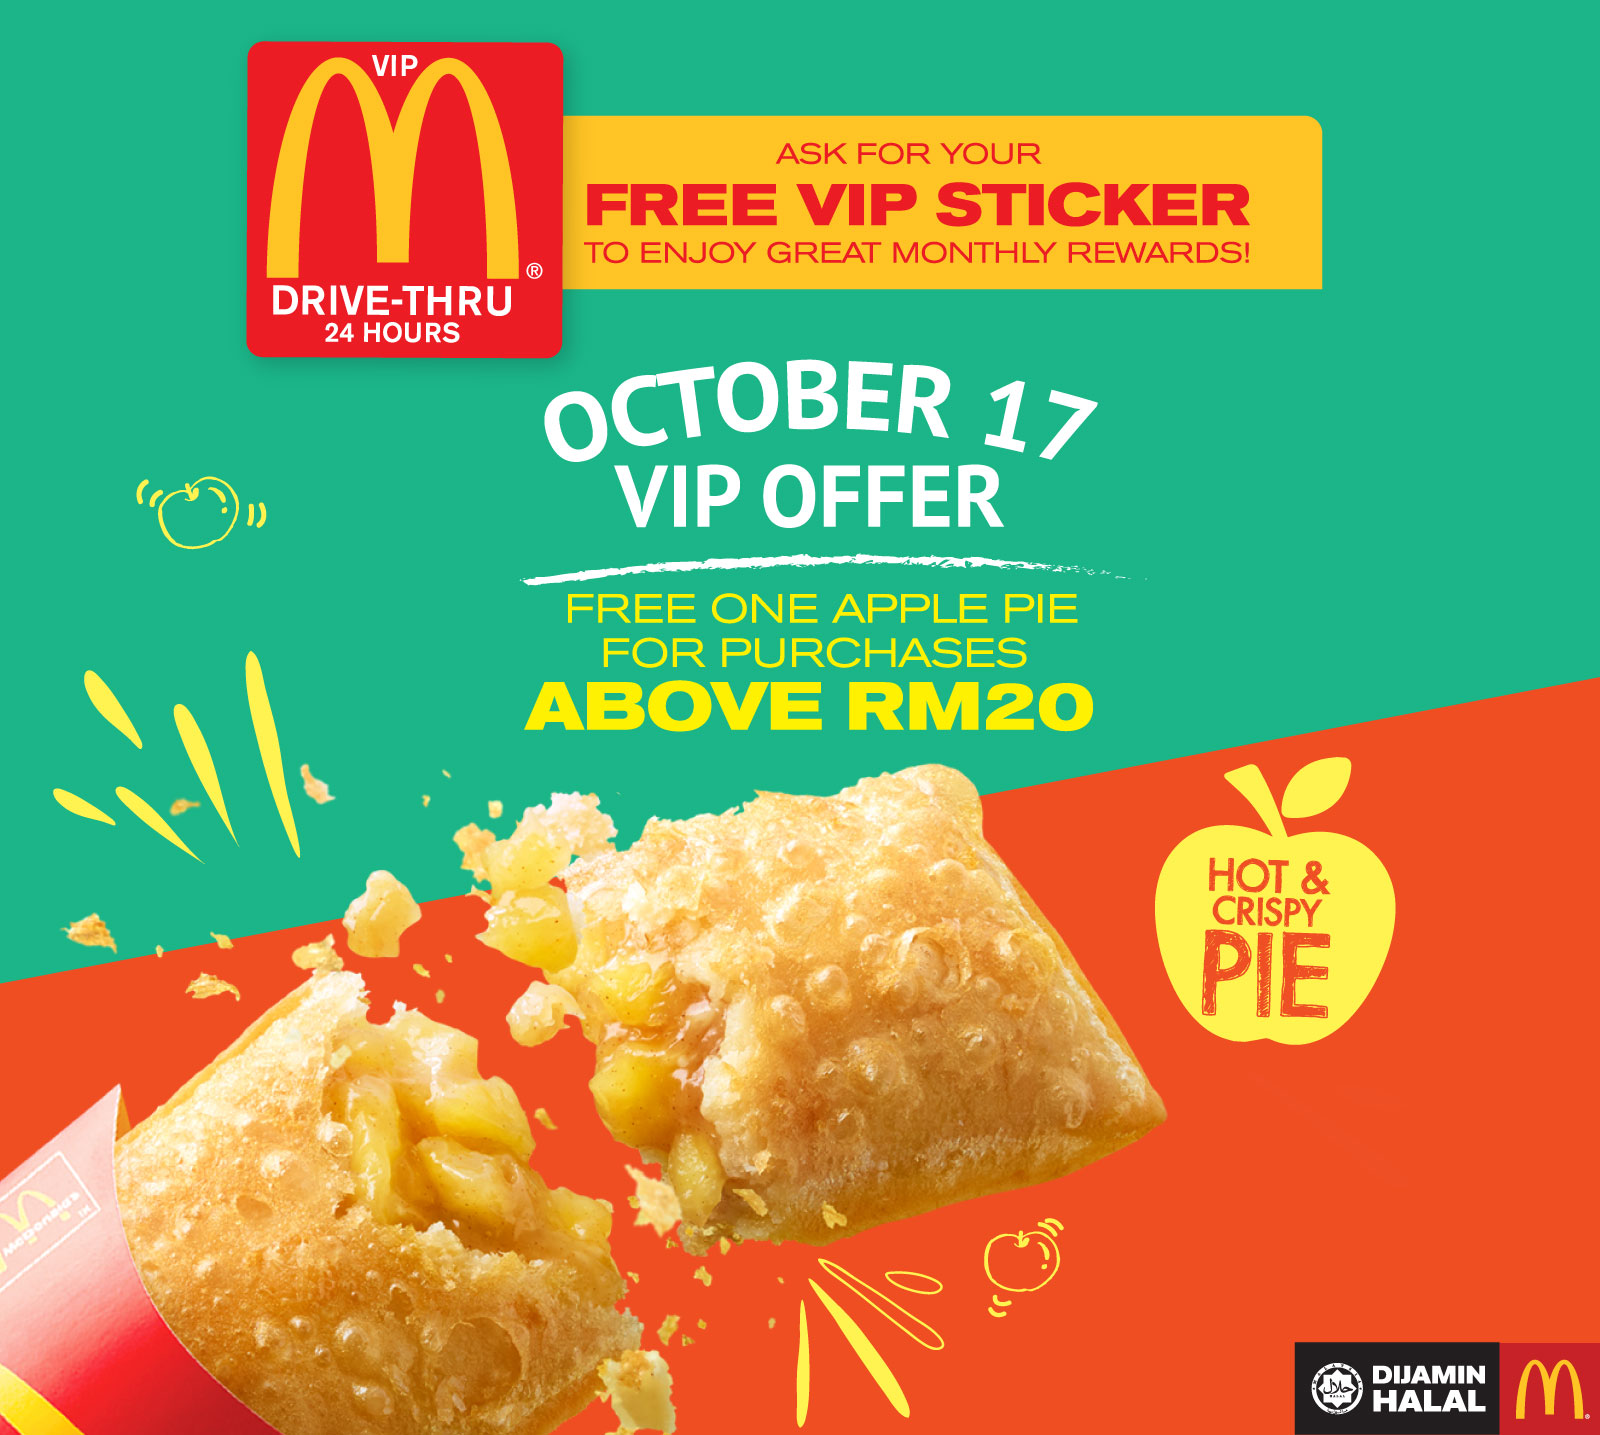 October 2017 Voucher Makan Papparich Mcd Vip Drive Thru Free Apple Pie Promo